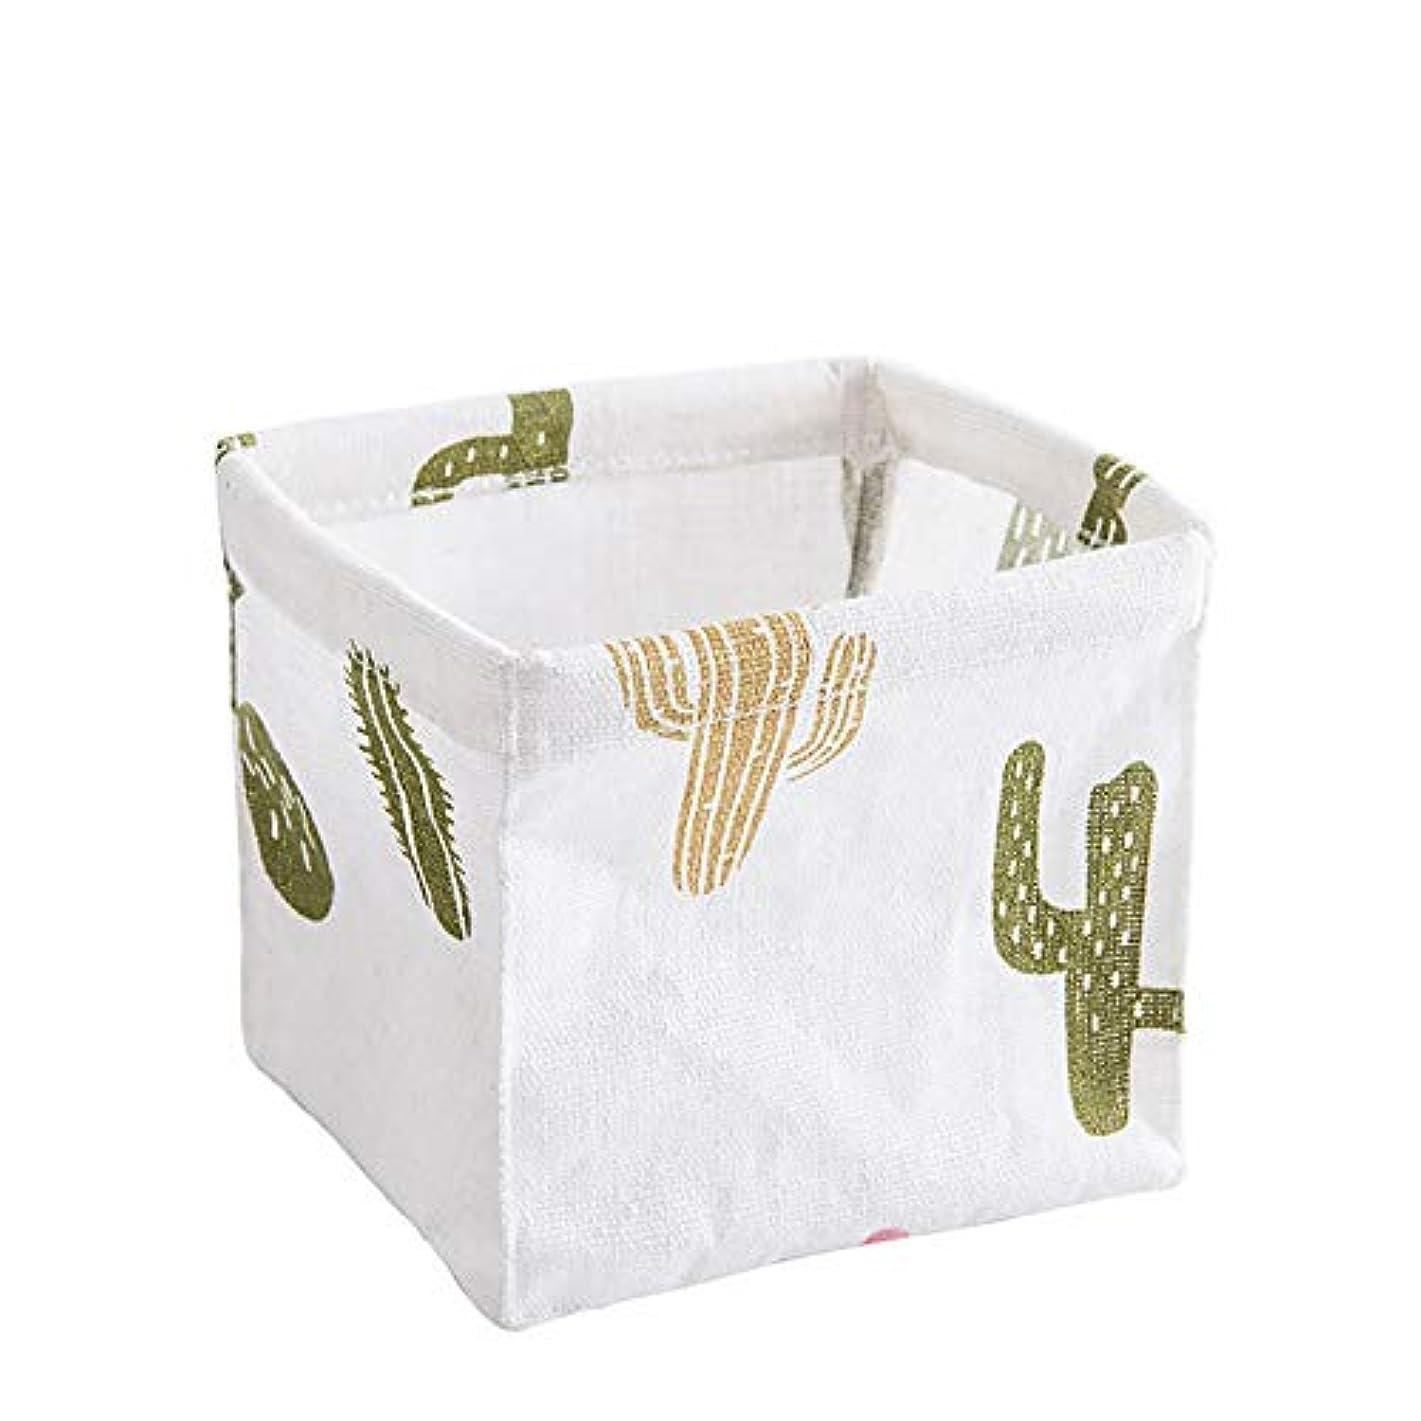 Storage Bins, Iuhan Storage Bin Closet Toy Box Container Organizer Fabric Basket (White)